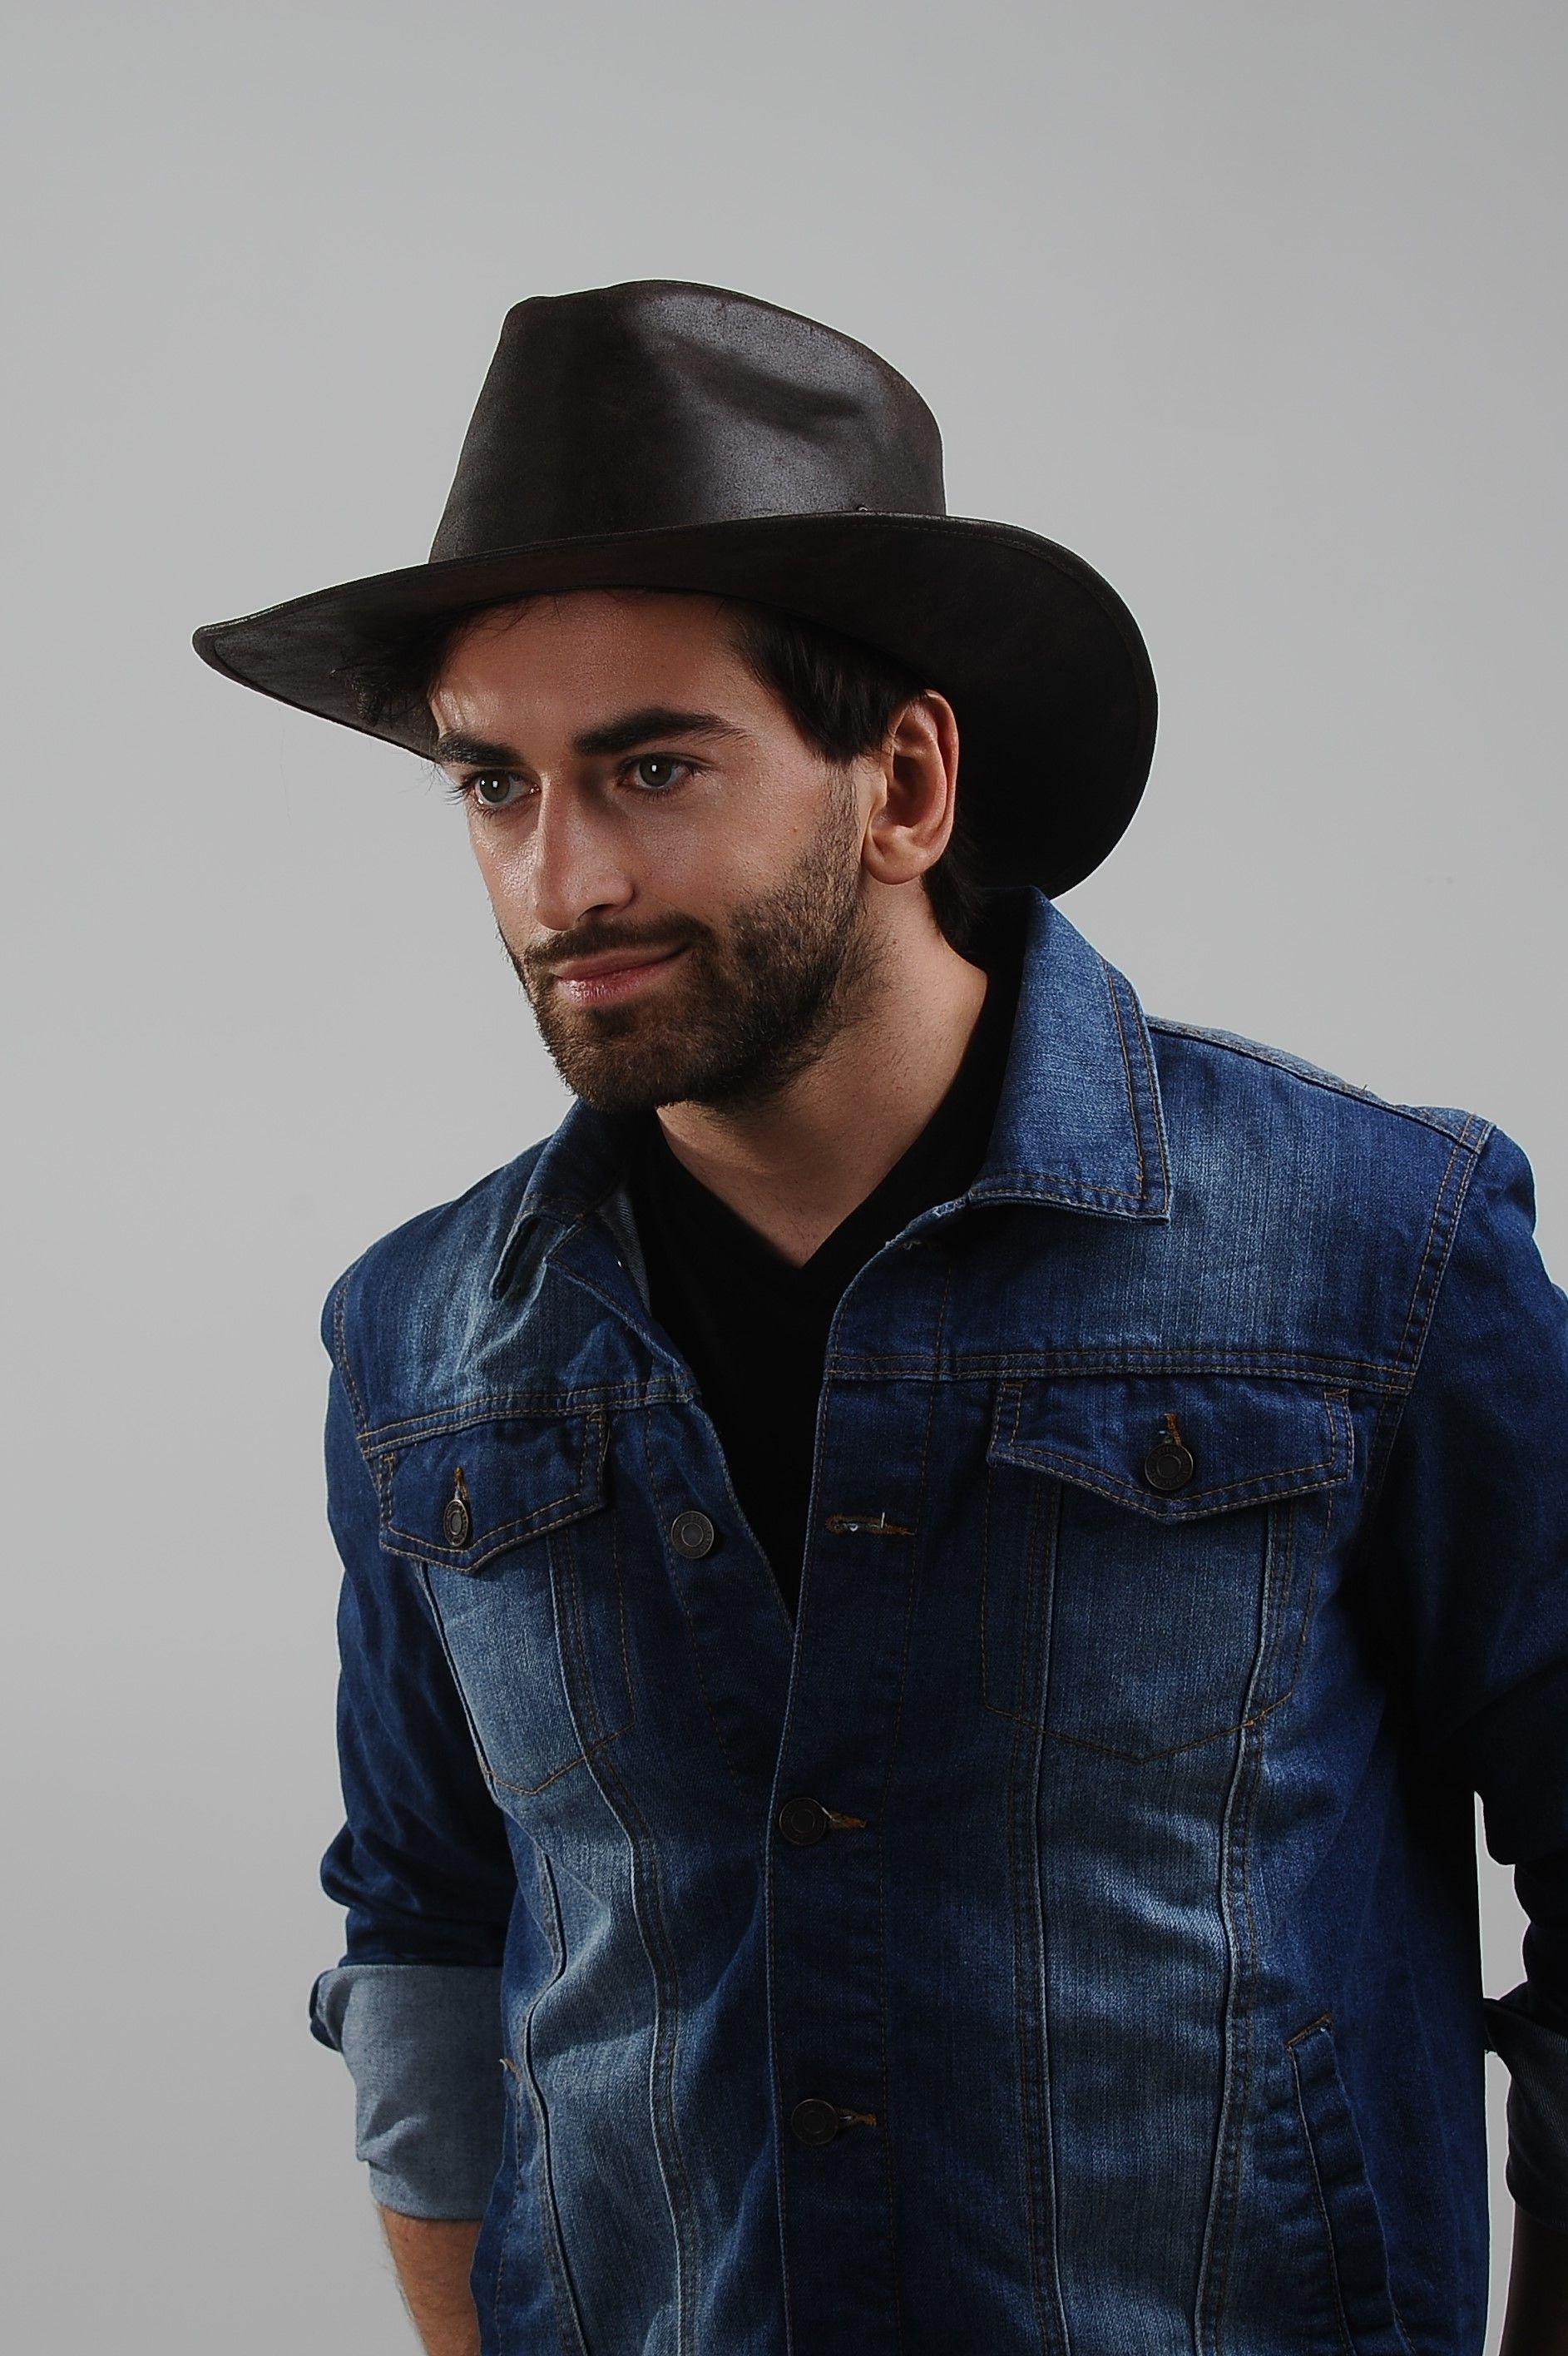 Buckaroo Genuine Leather Cowboy Hat Western Desert Wild Outback Western Cowboy Hats Cowboy Hats Leather Cowboy Hats